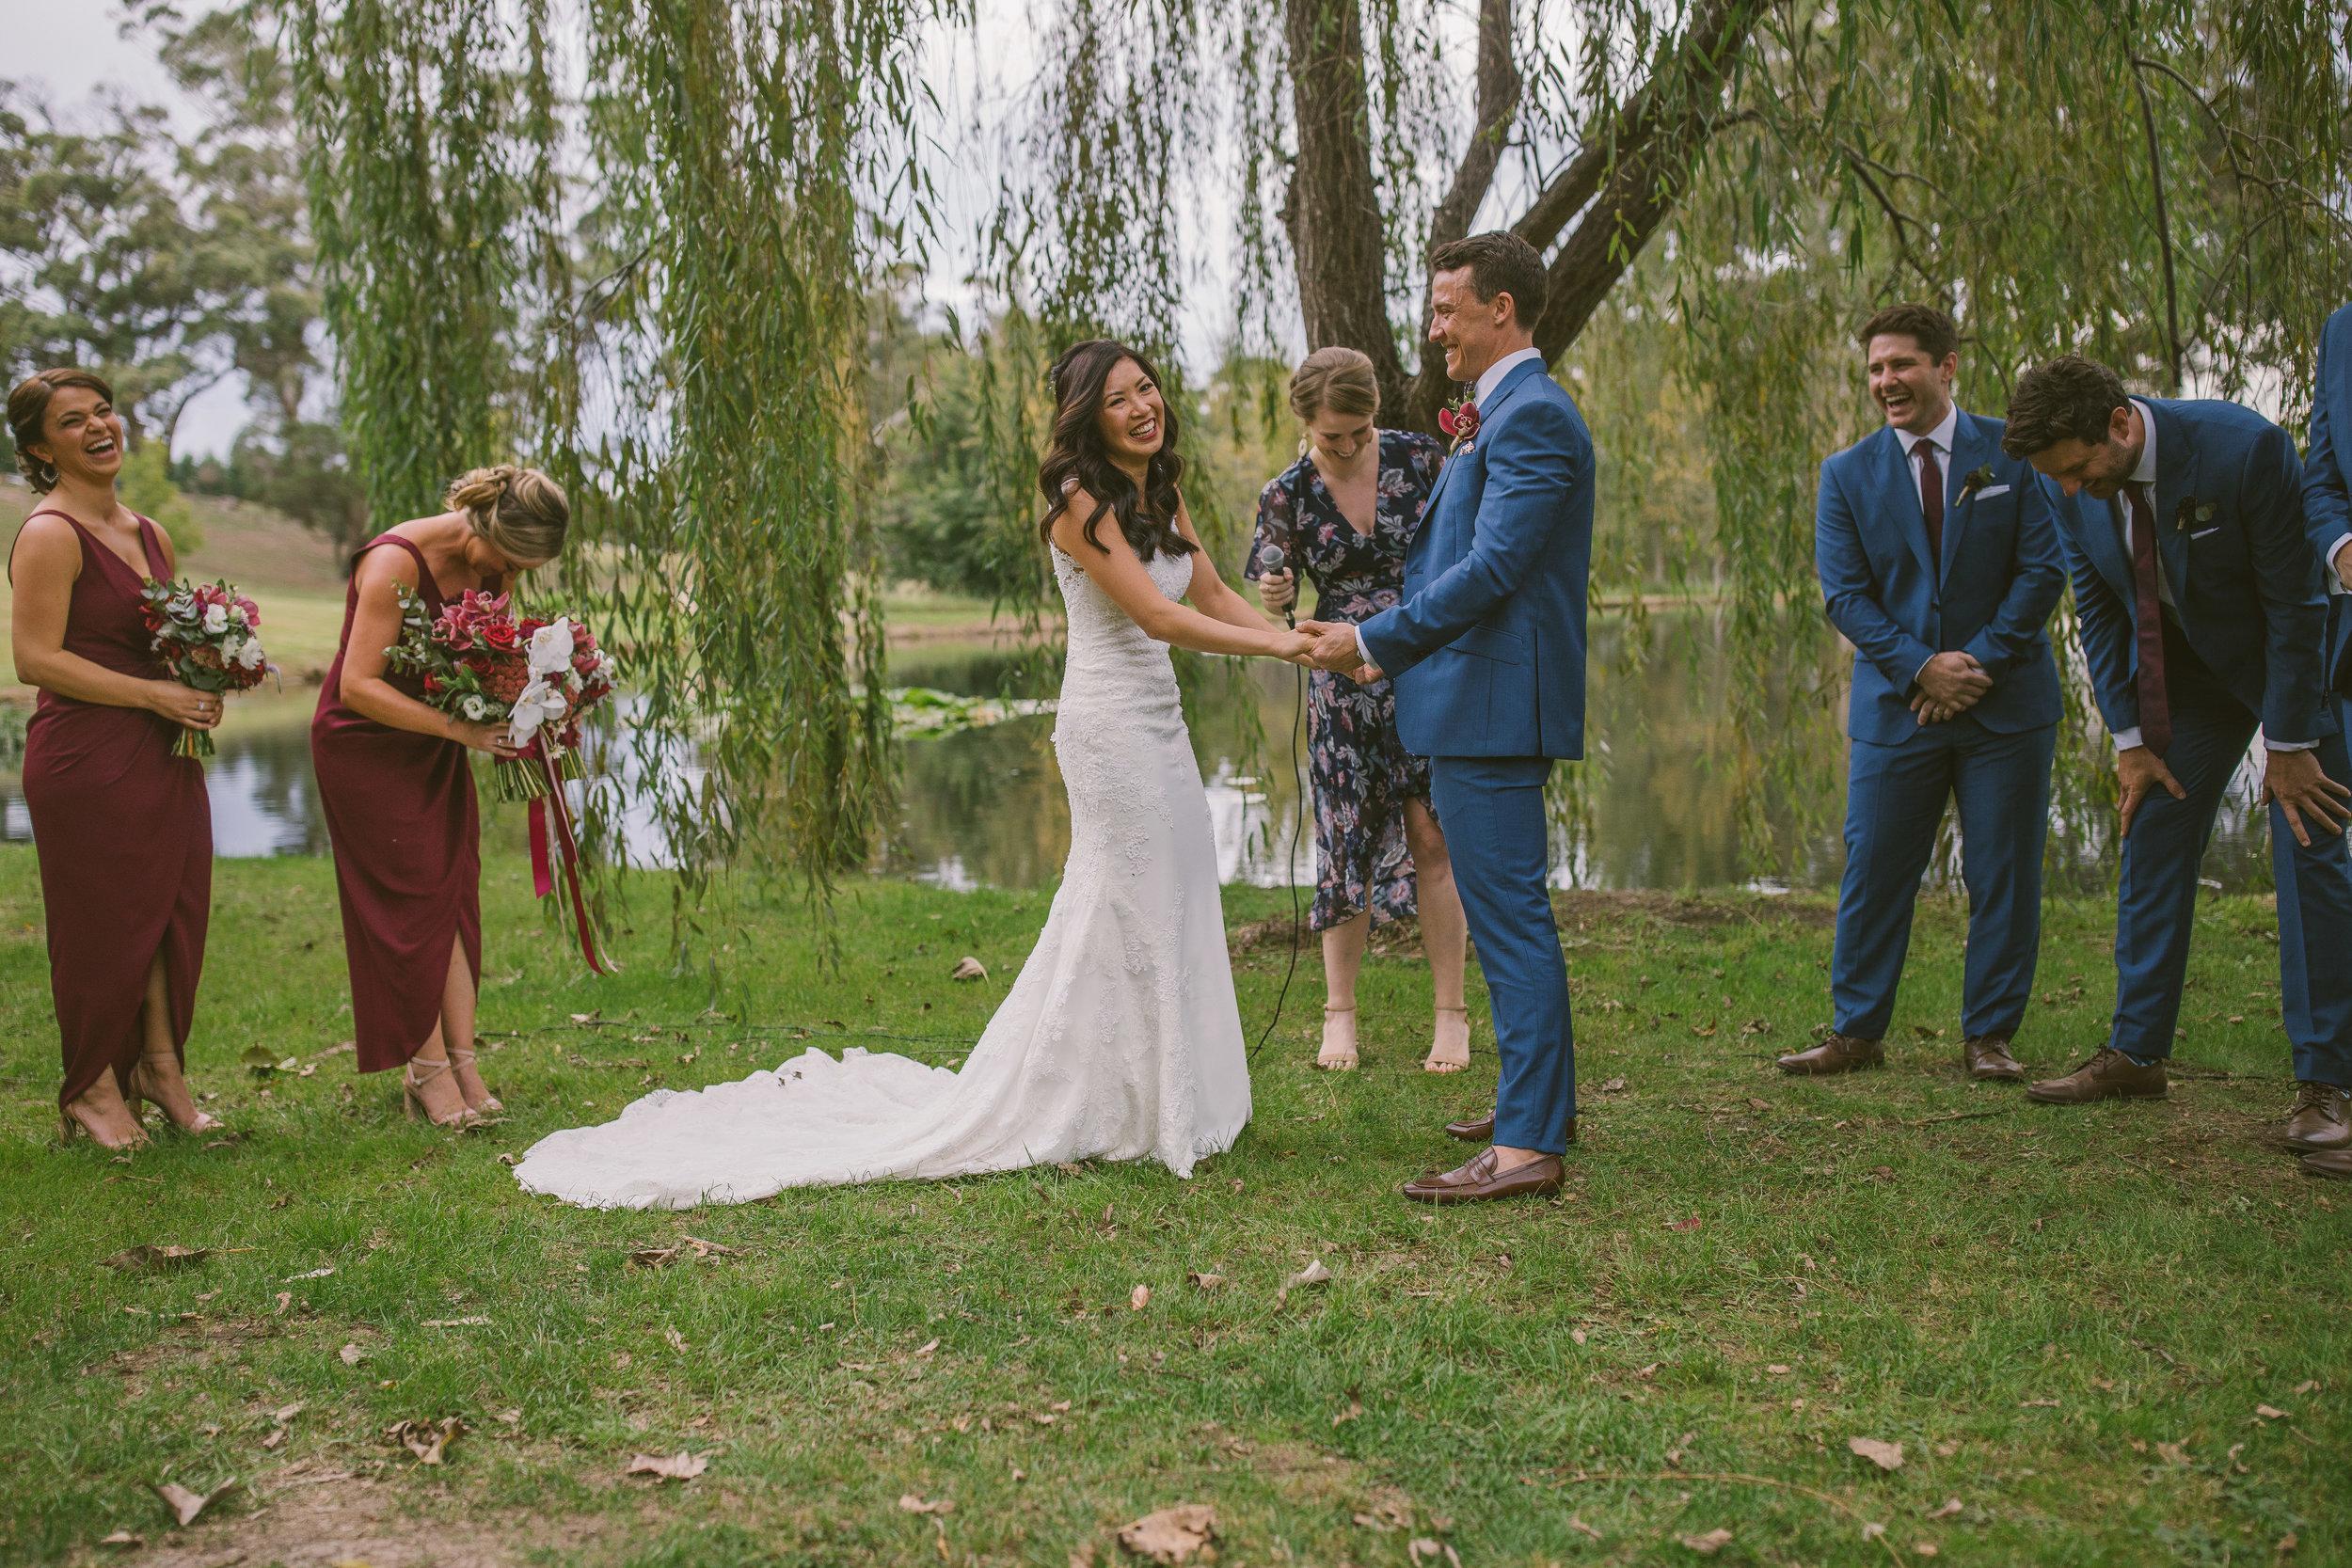 Sarah + Jason - Mali Brae Farm Wedding Photographer - Magnus Agren Photography-0261.jpg